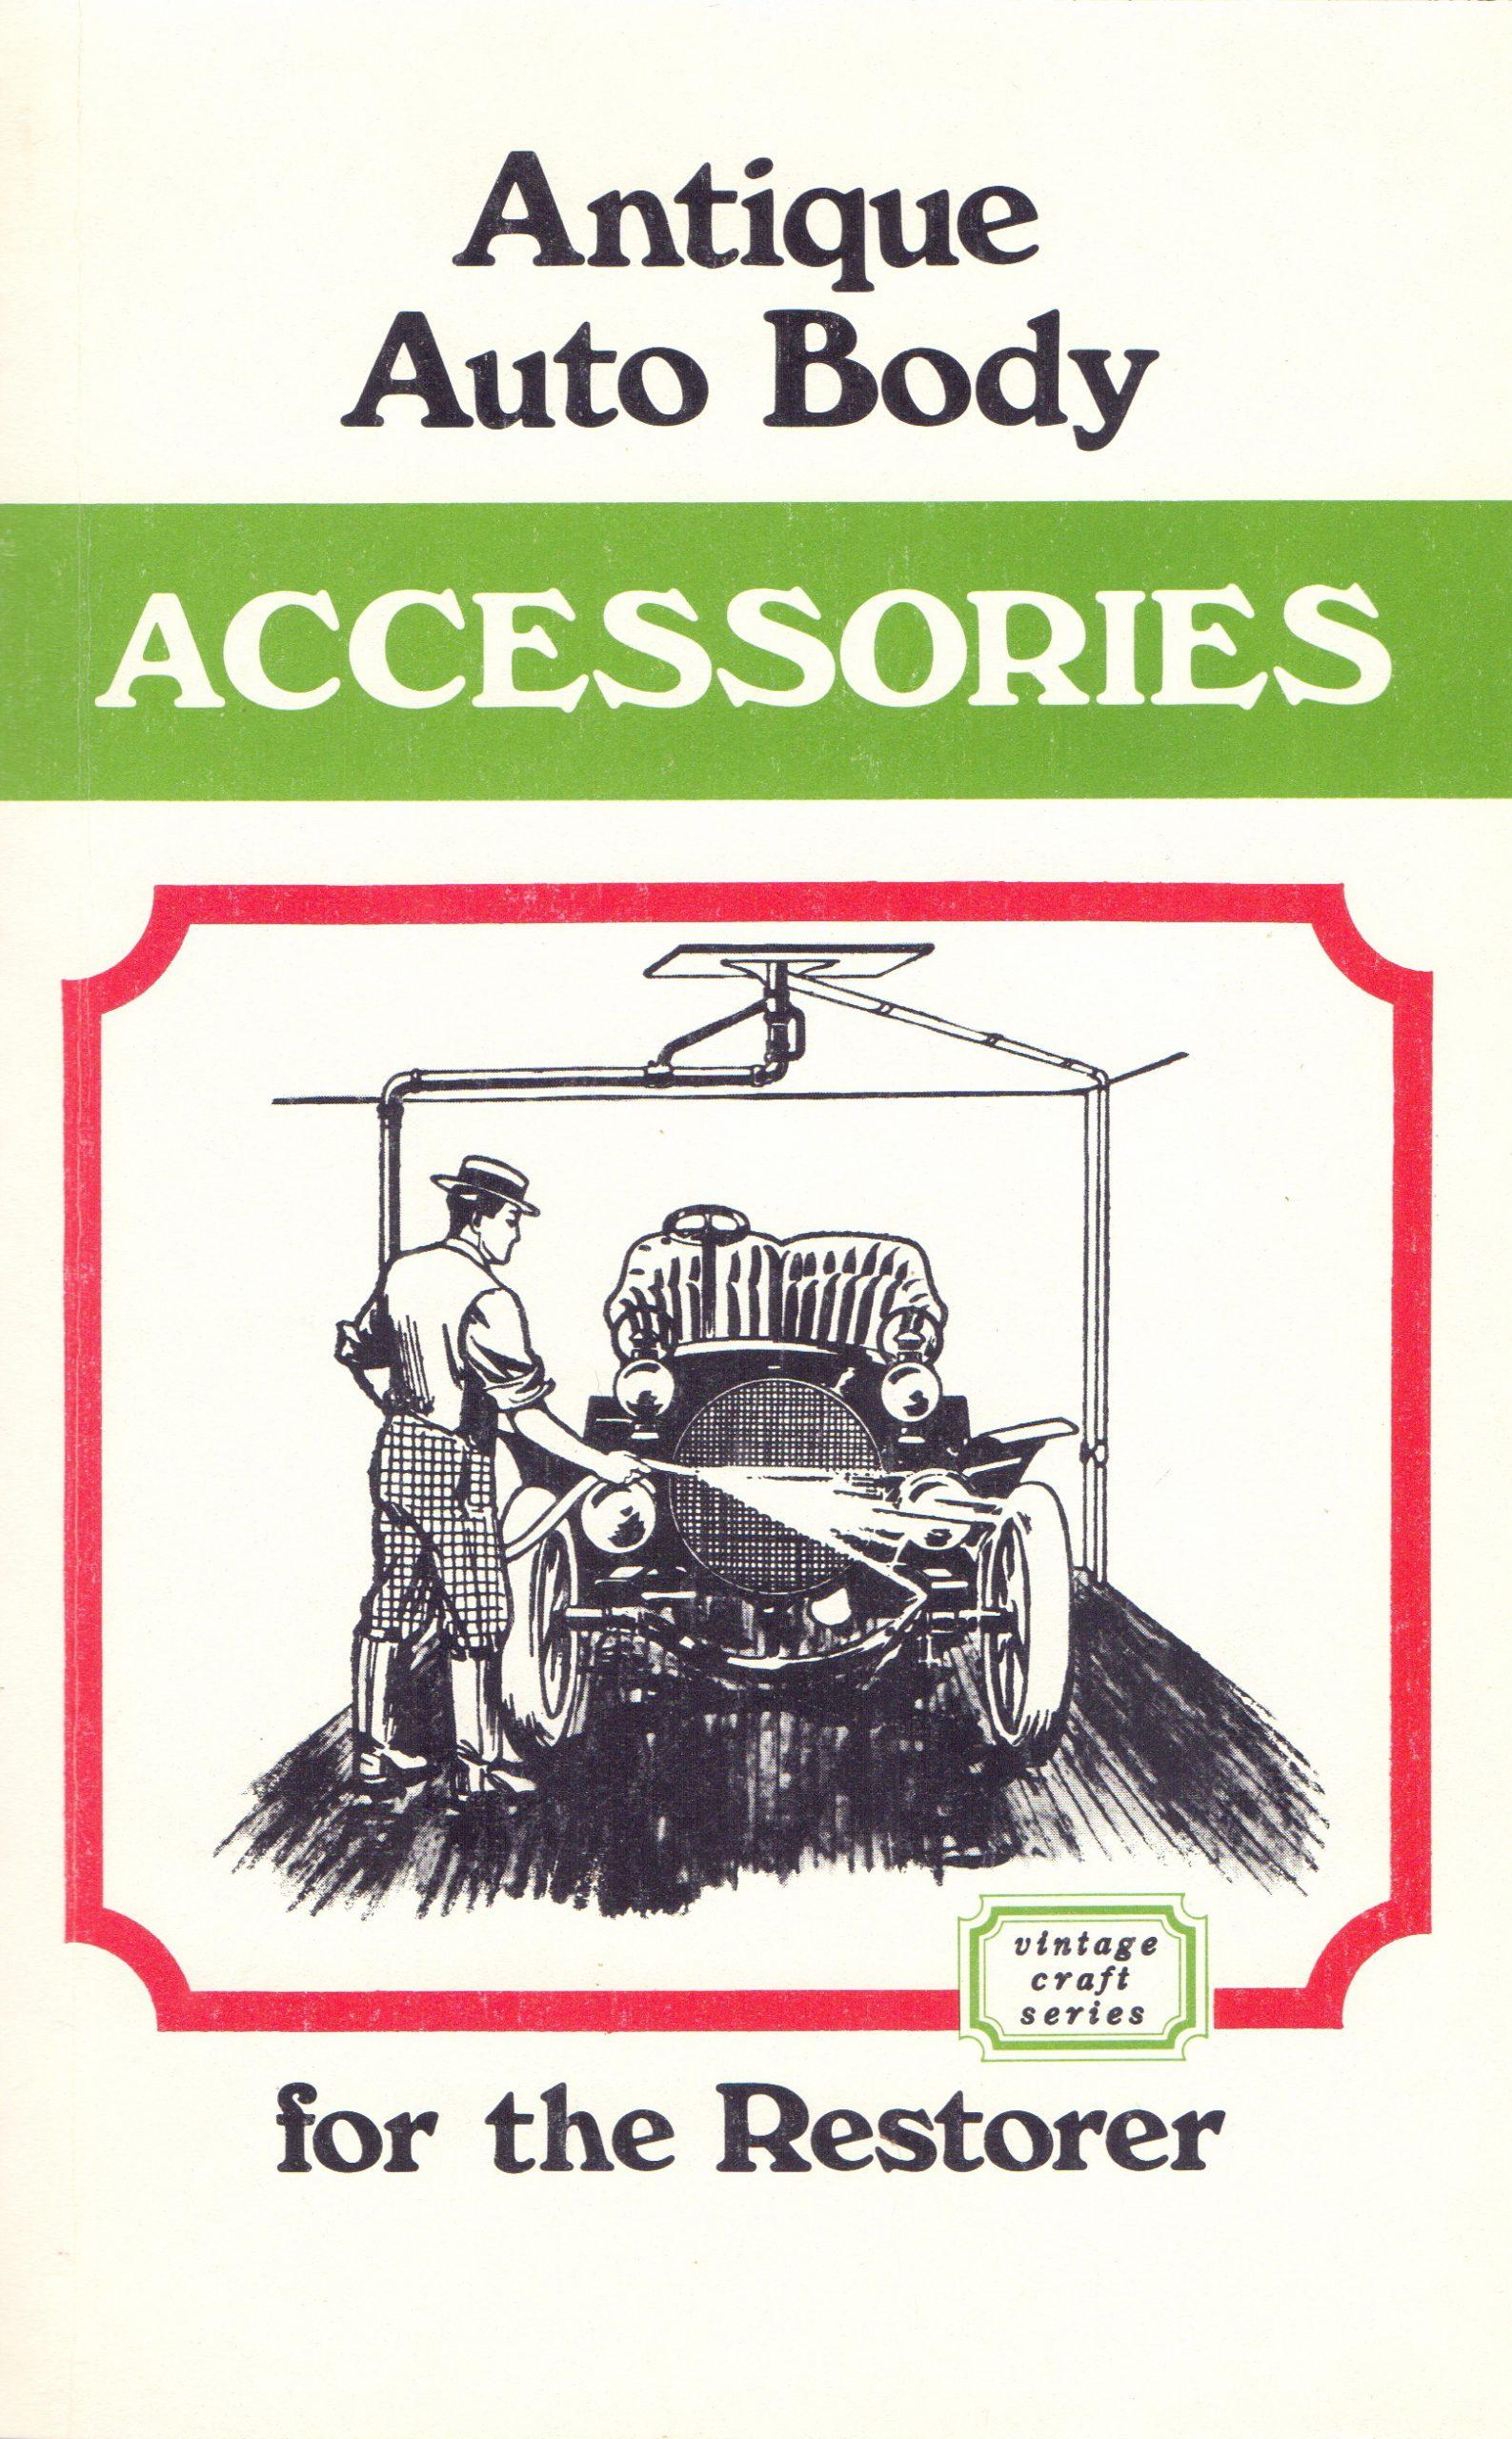 Antique Auto Body Accessories